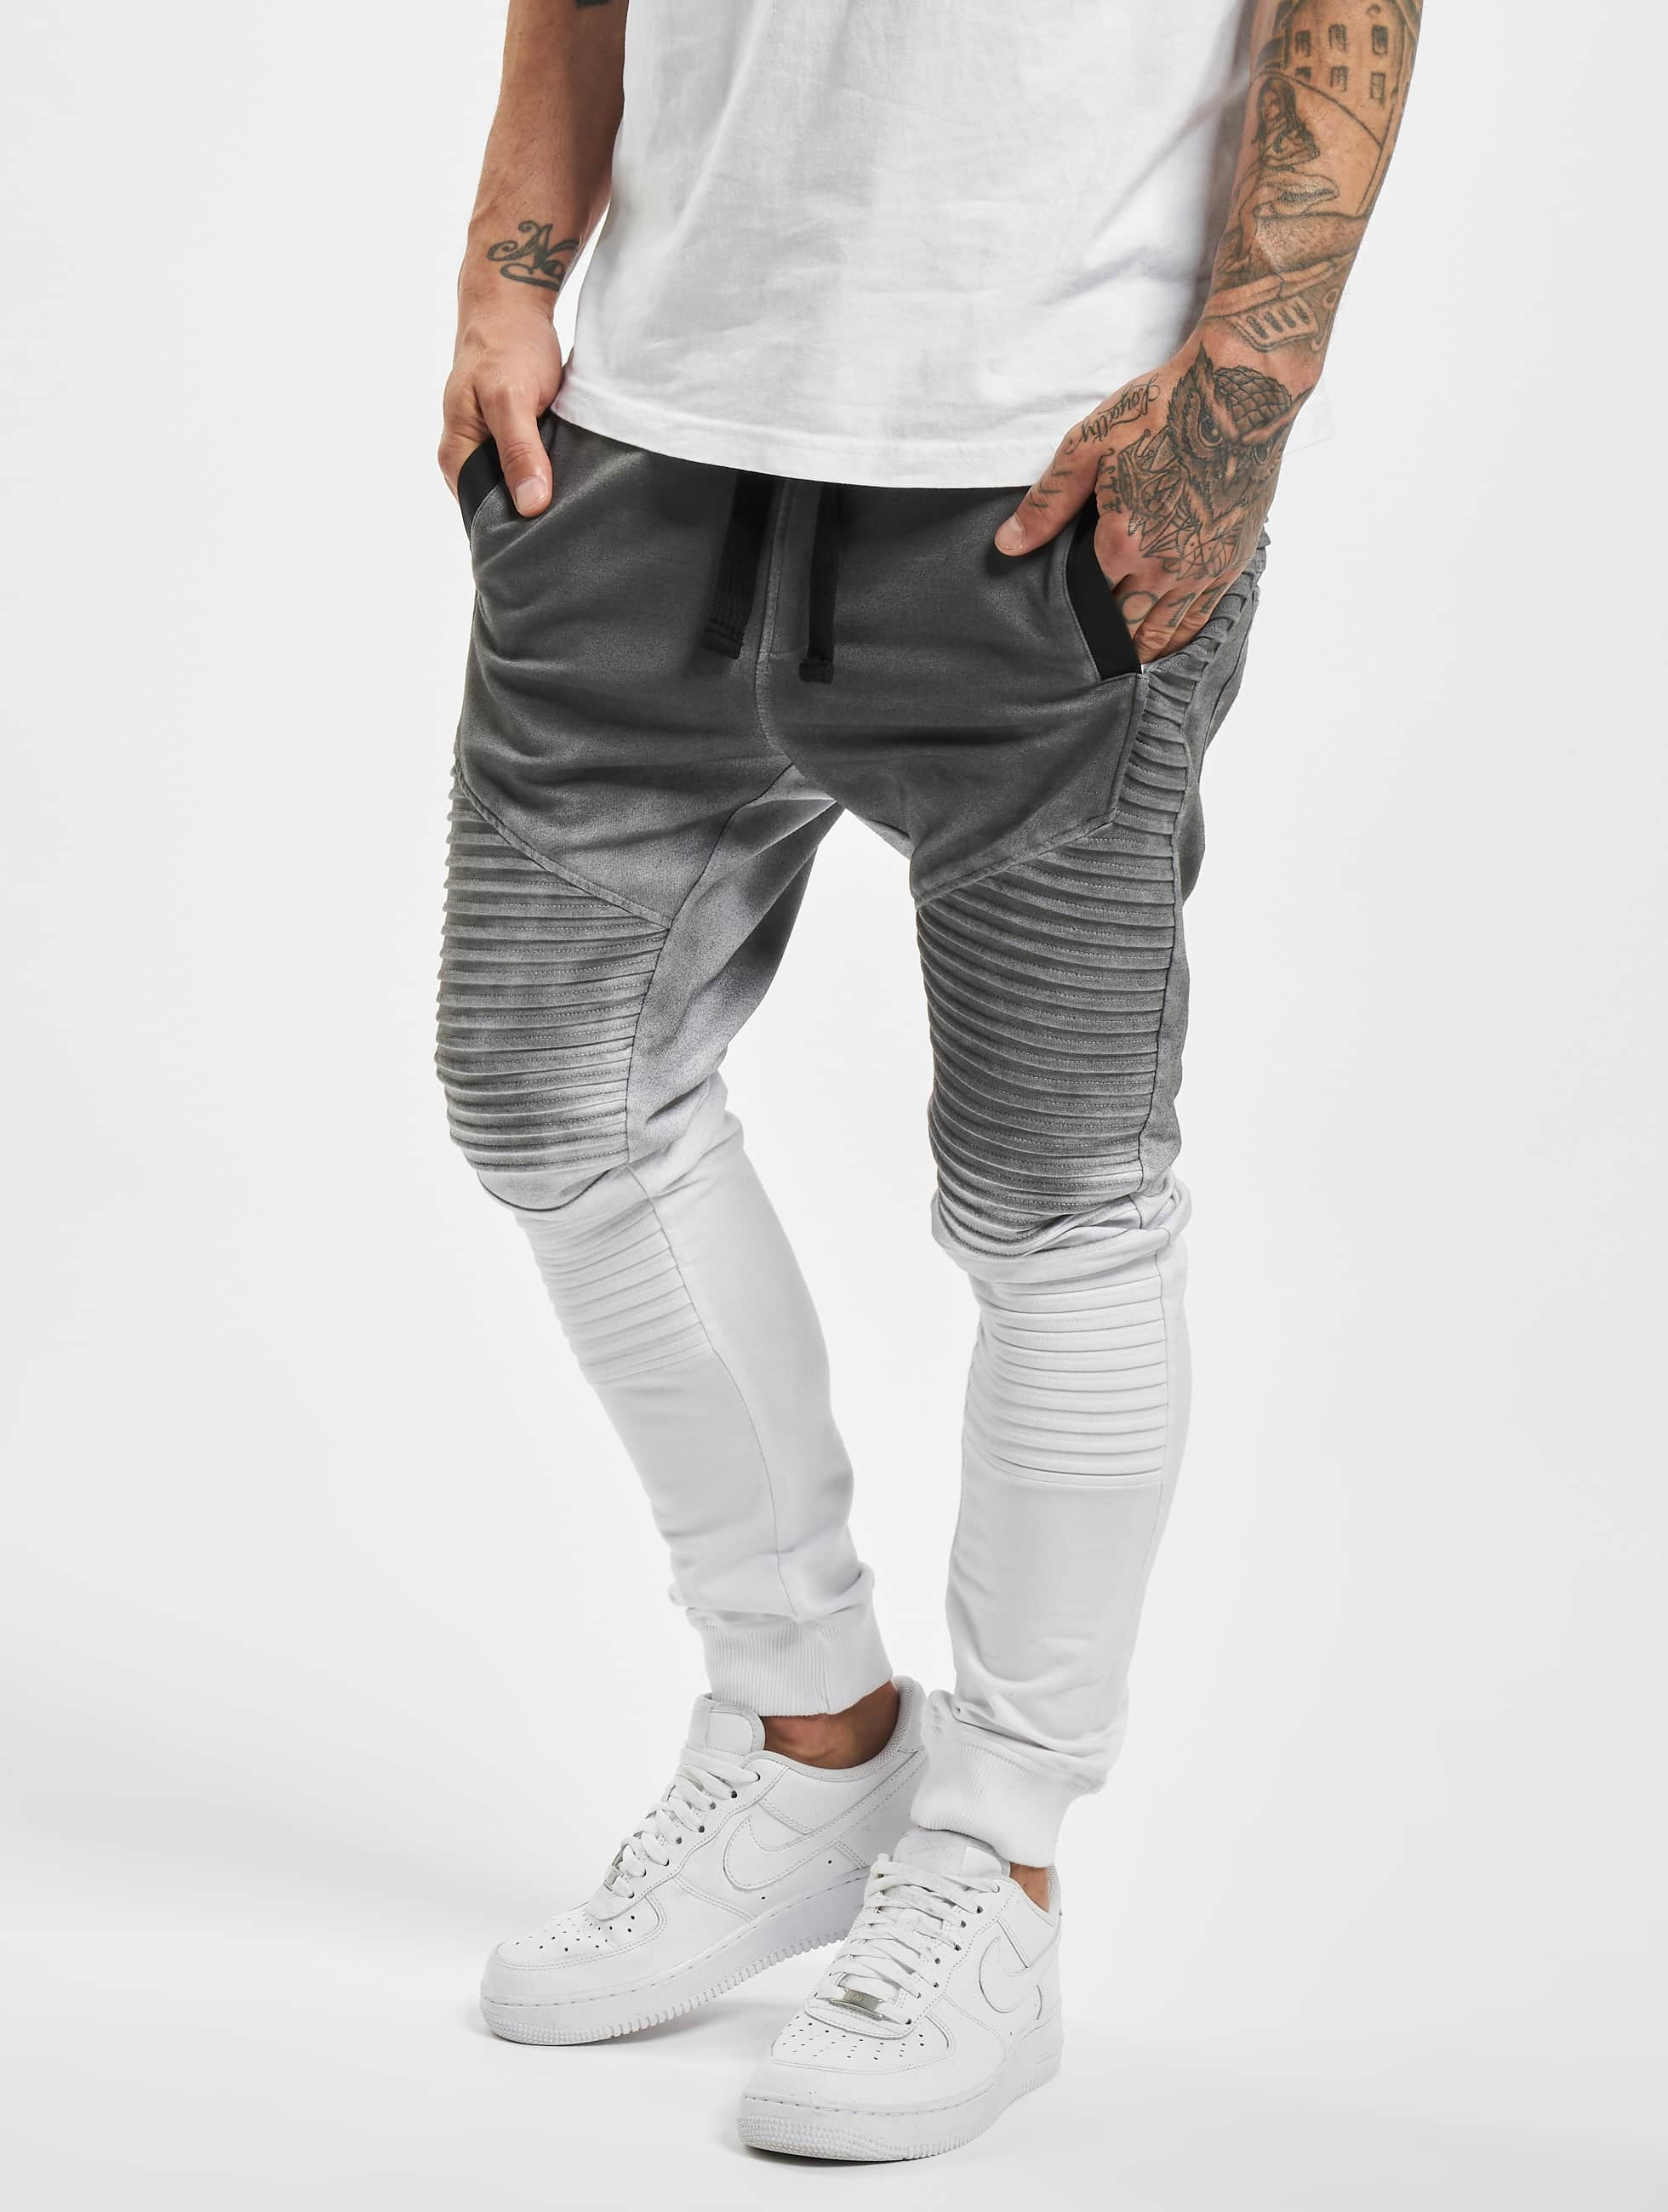 josefines offenbach clubwear herren